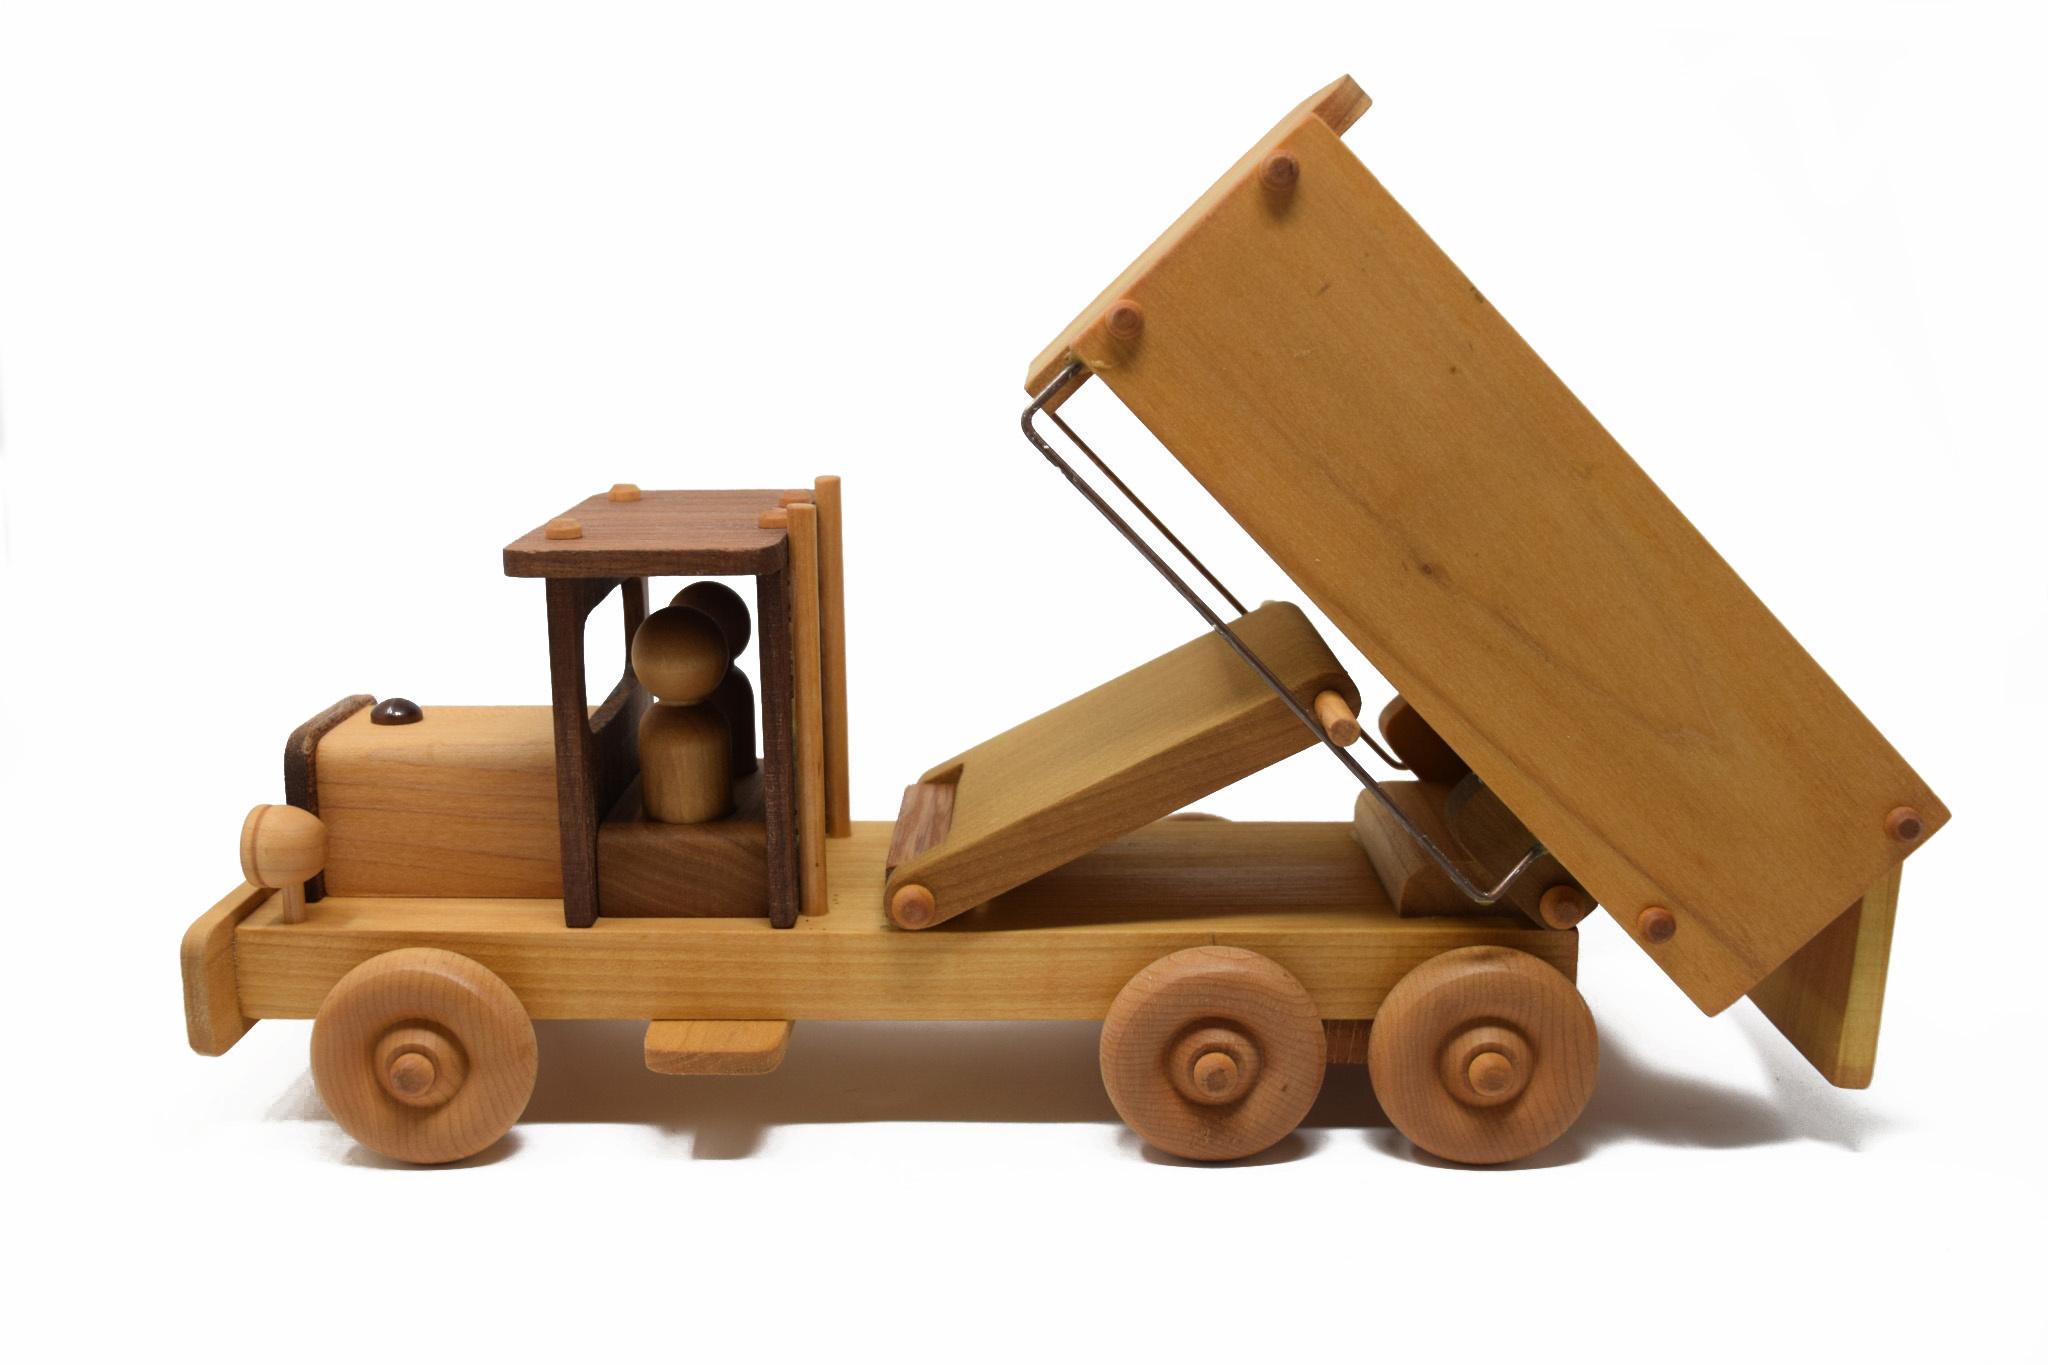 Wooden Dump Truck Toy-1